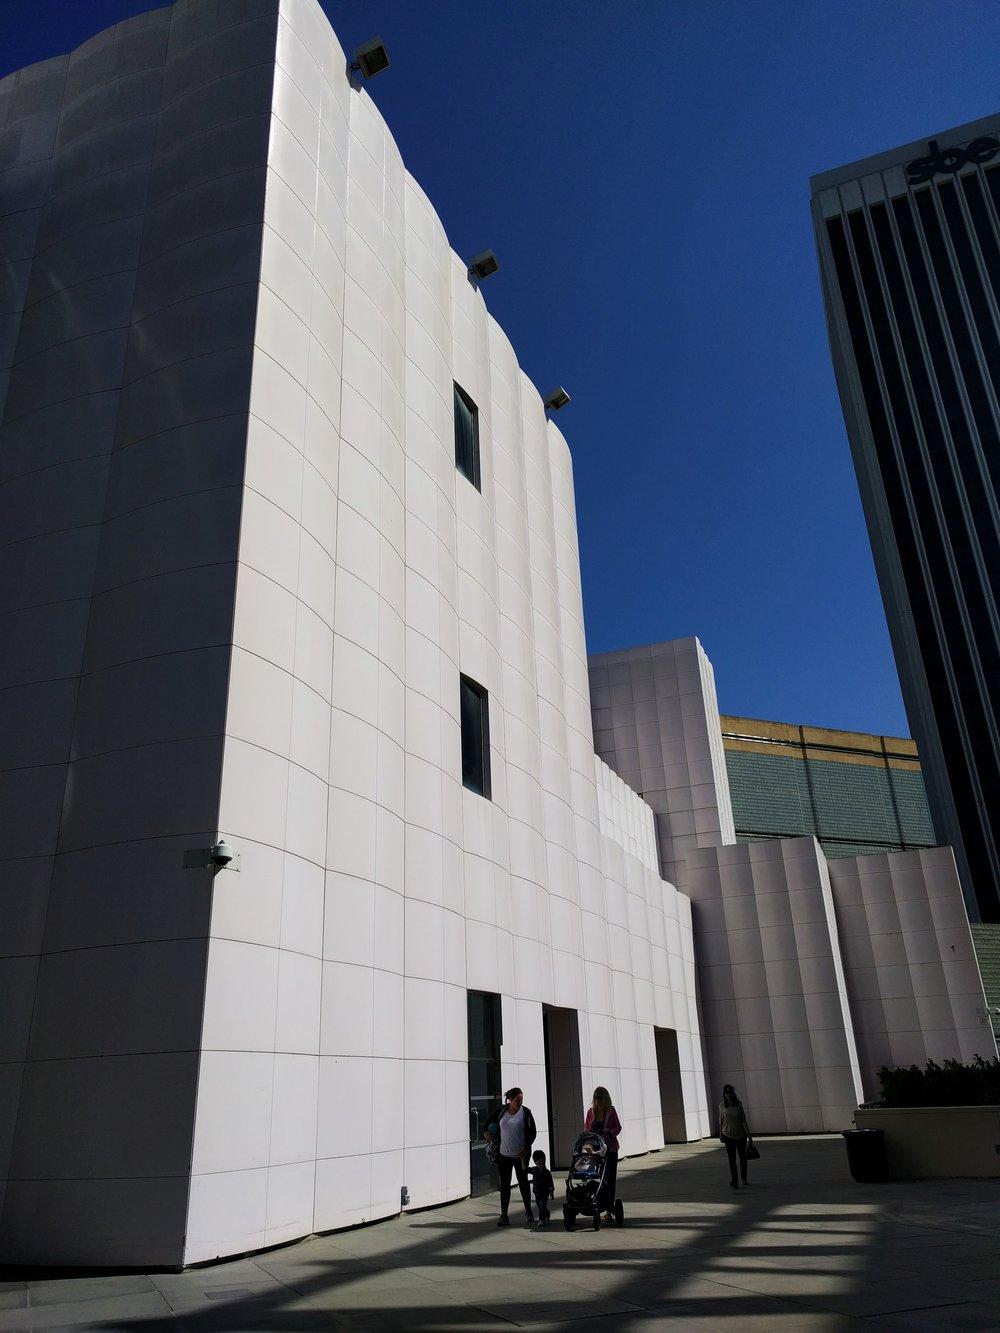 lacma-architecture-white-on-blue